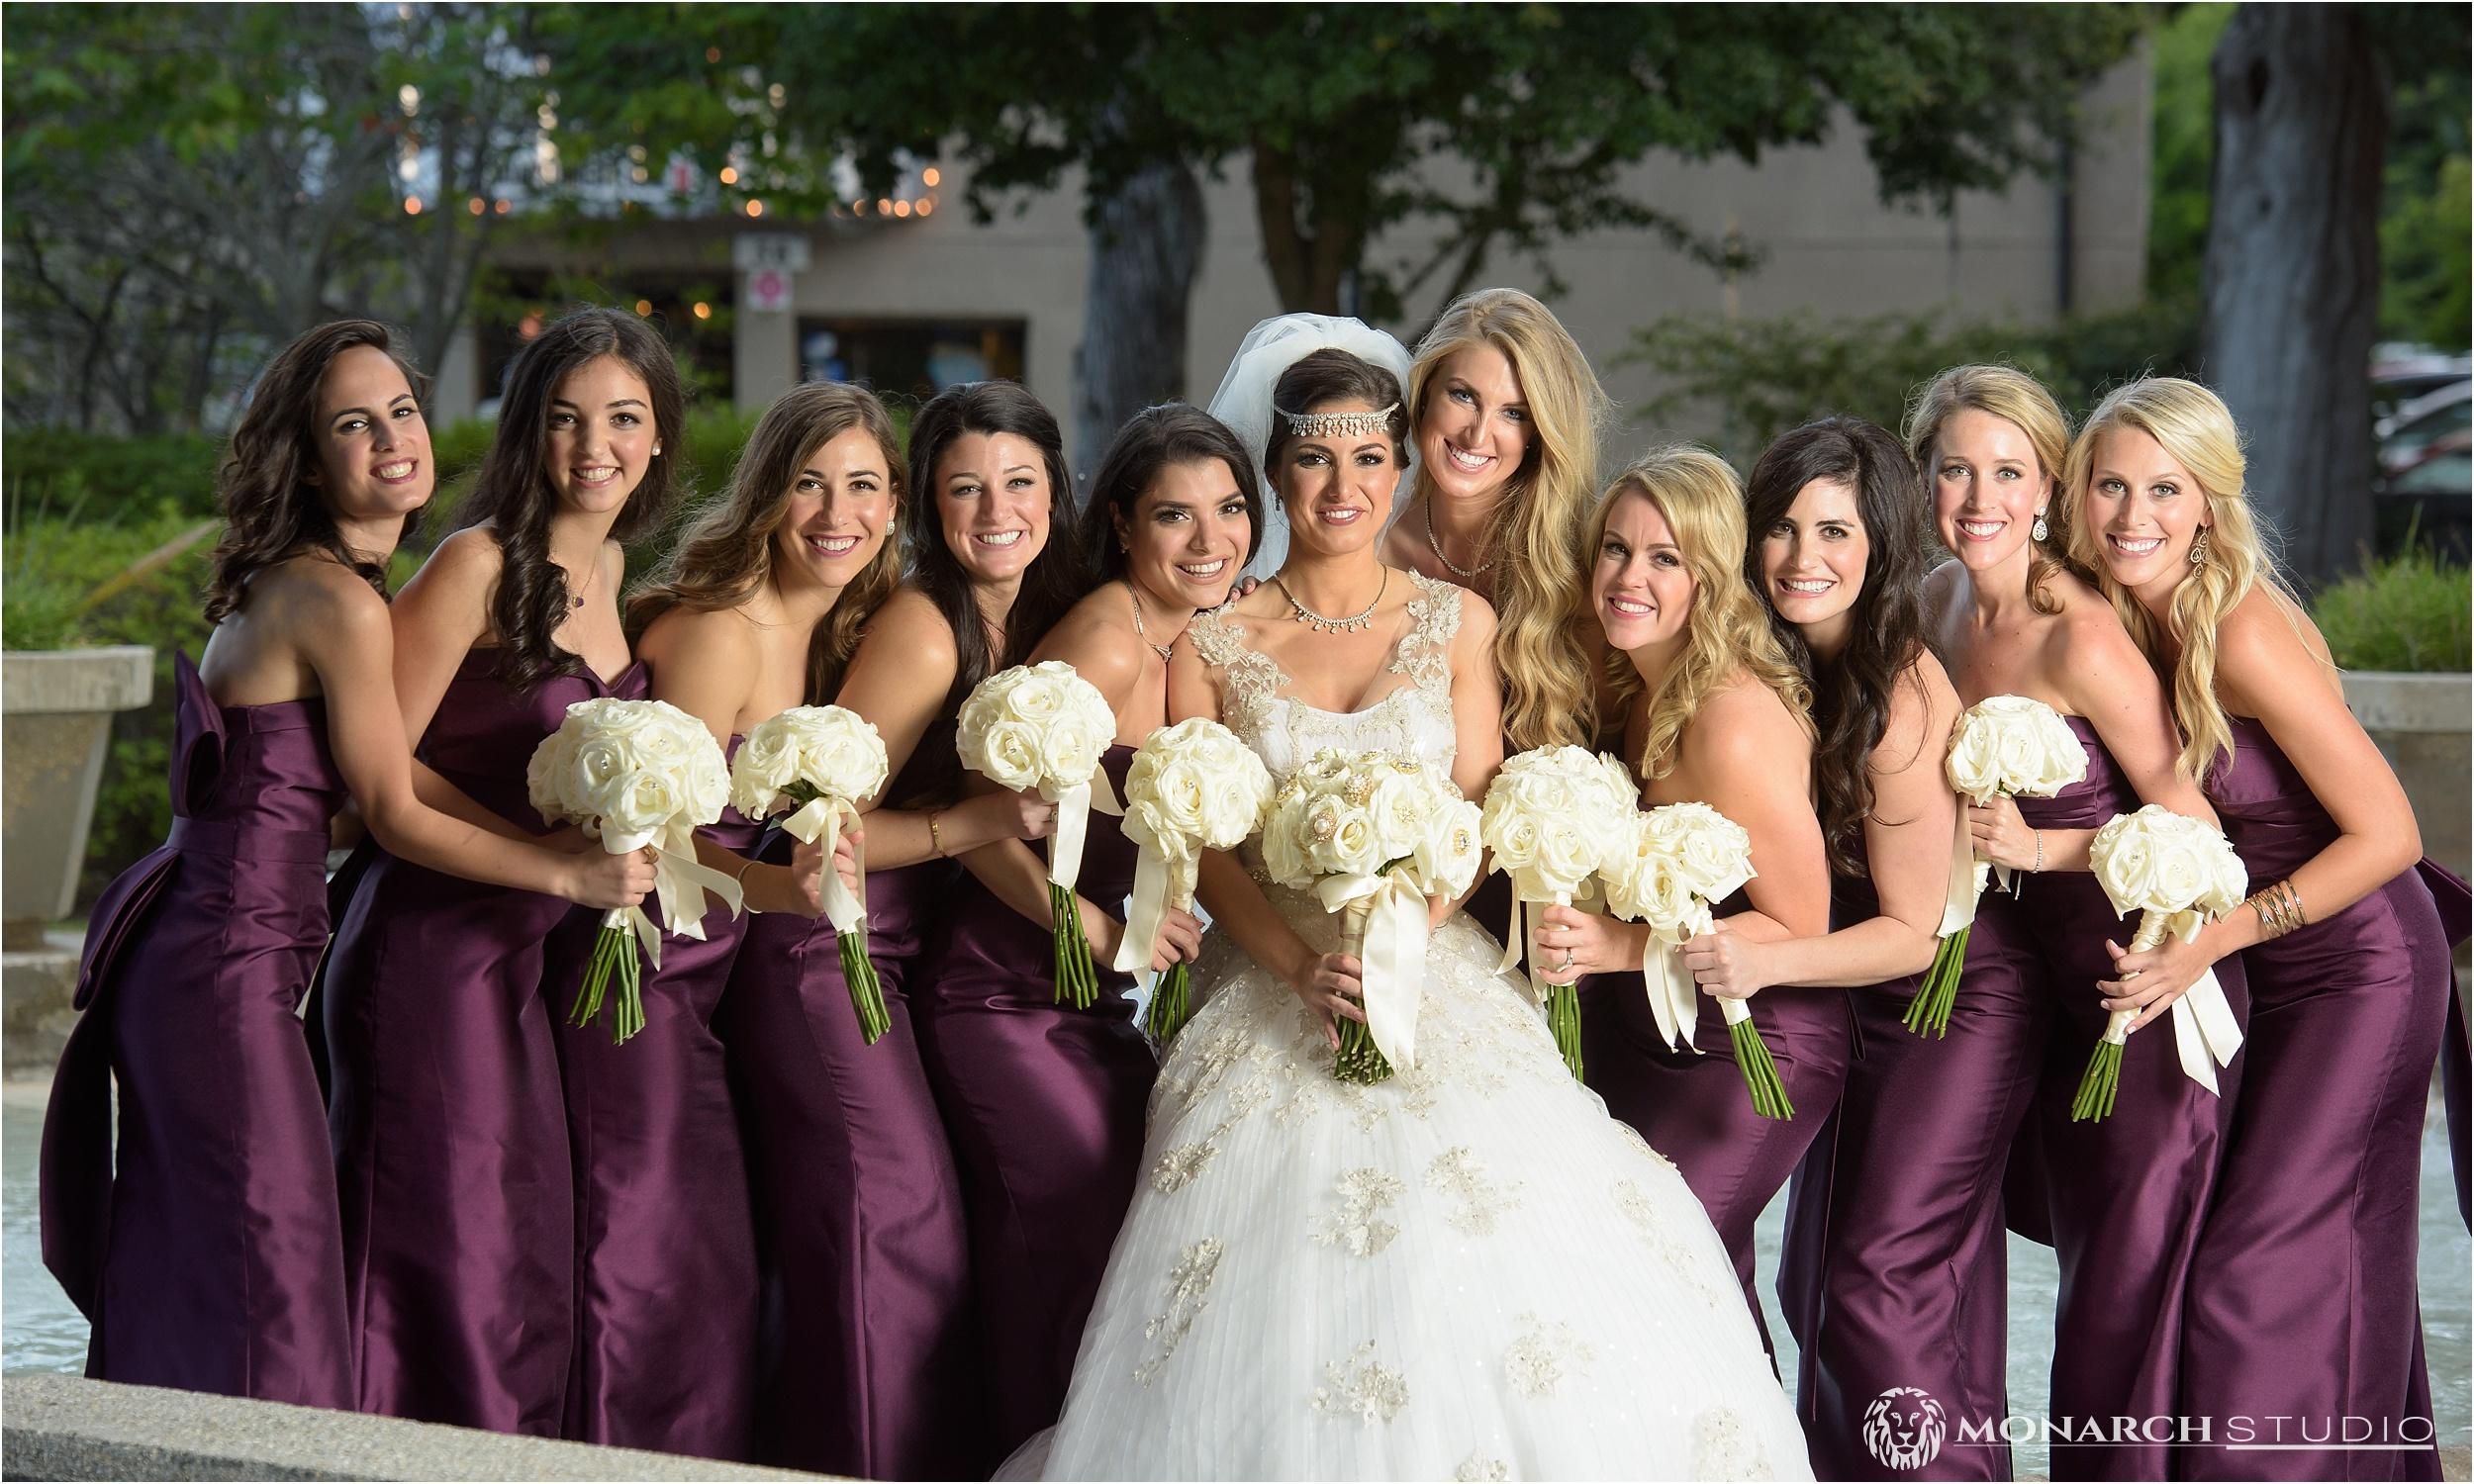 Persian-Aghd-Wedding-Photographer- سفره عقد-052.jpg